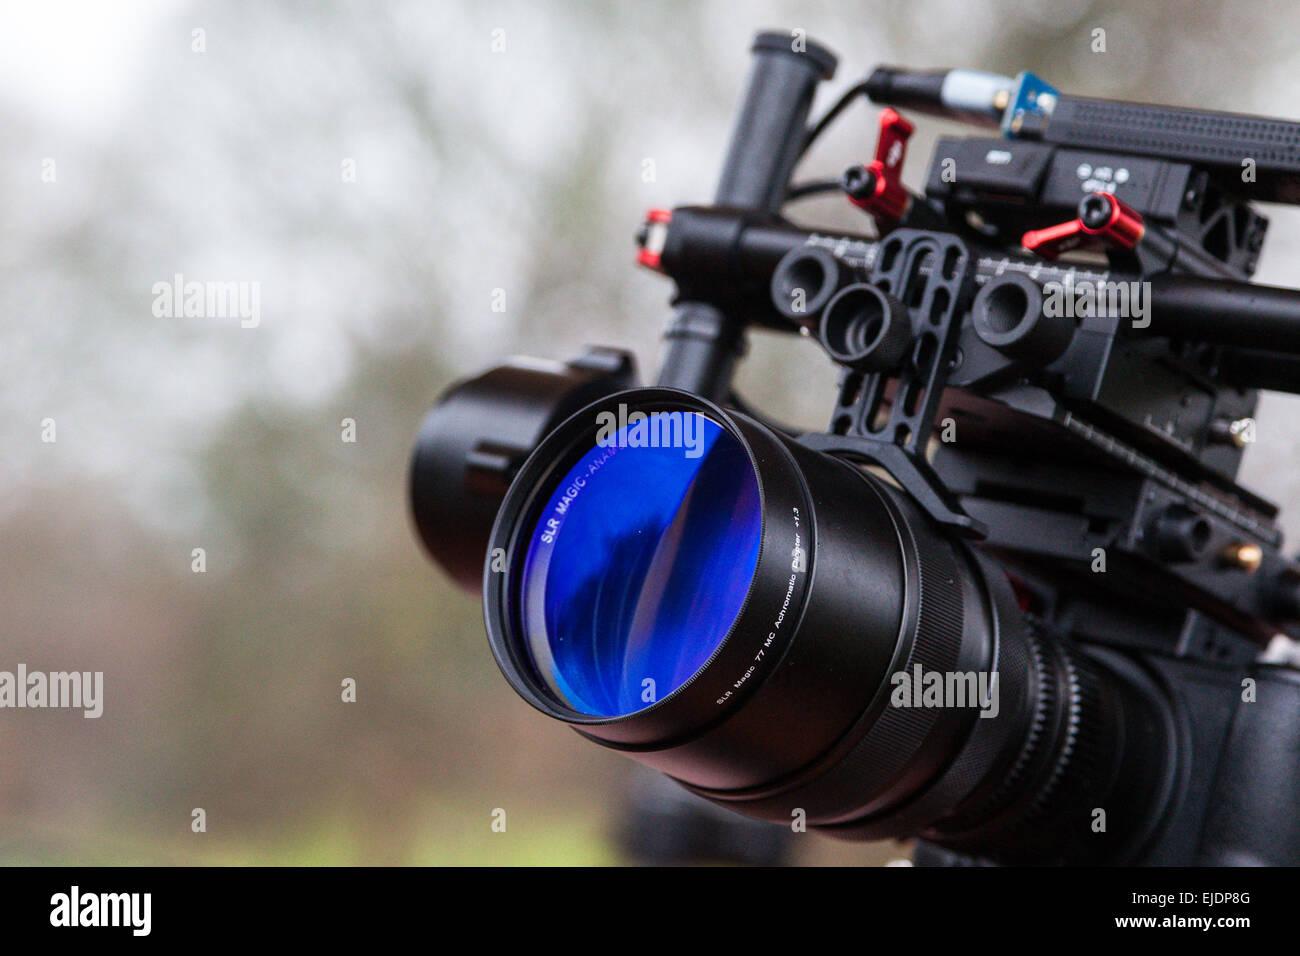 Panasonic GFH4 and anamorphot adapter on an slr magic lens, mounted on a Dji Ronin 3-axis gimbal - Stock Image